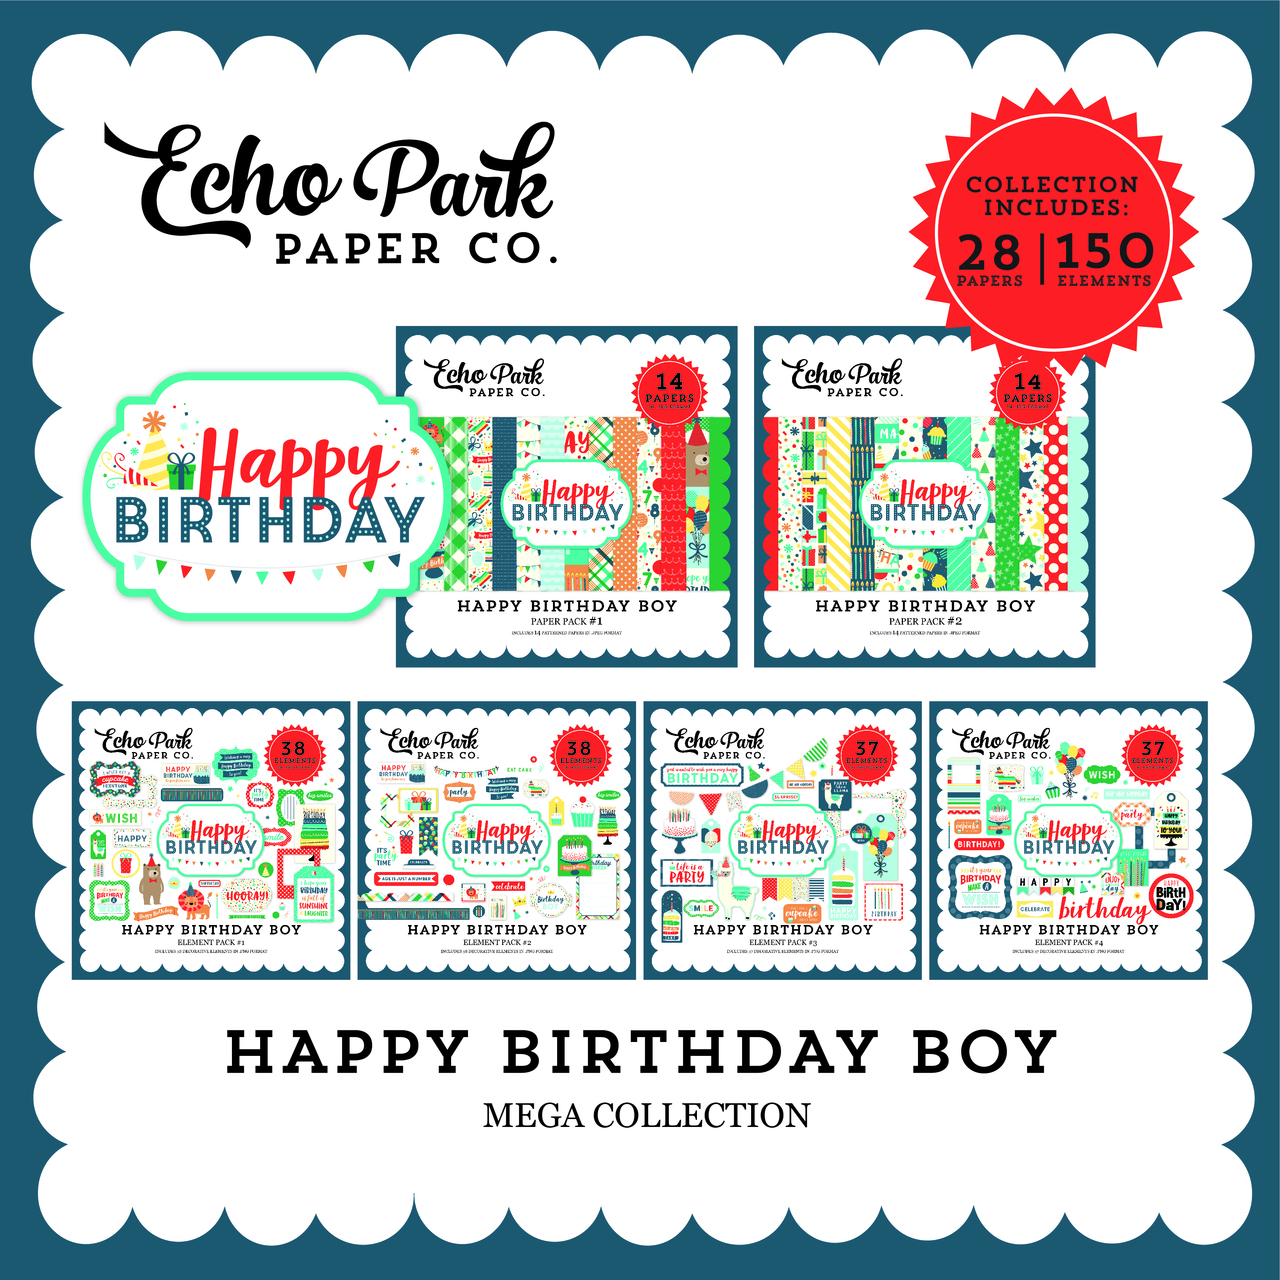 Happy Birthday Boy Mega Collection